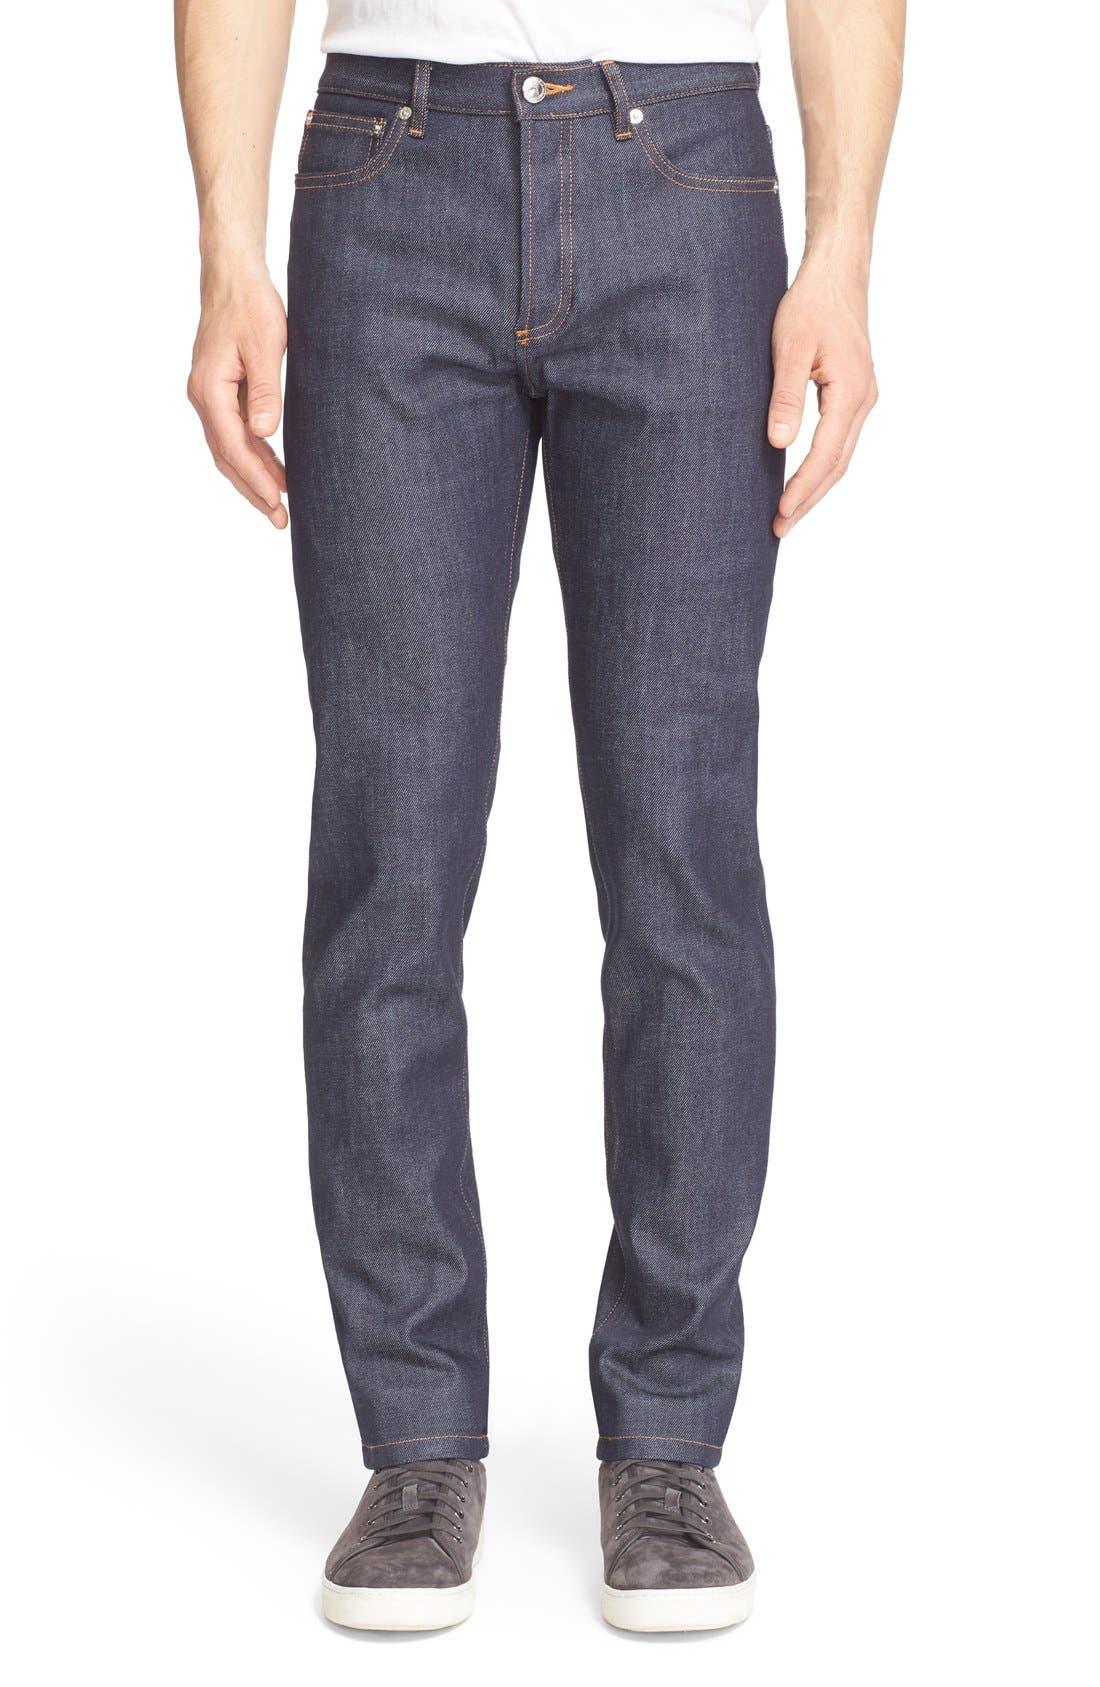 A.P.C. 'Petite New Standard' Skinny Fit Jeans